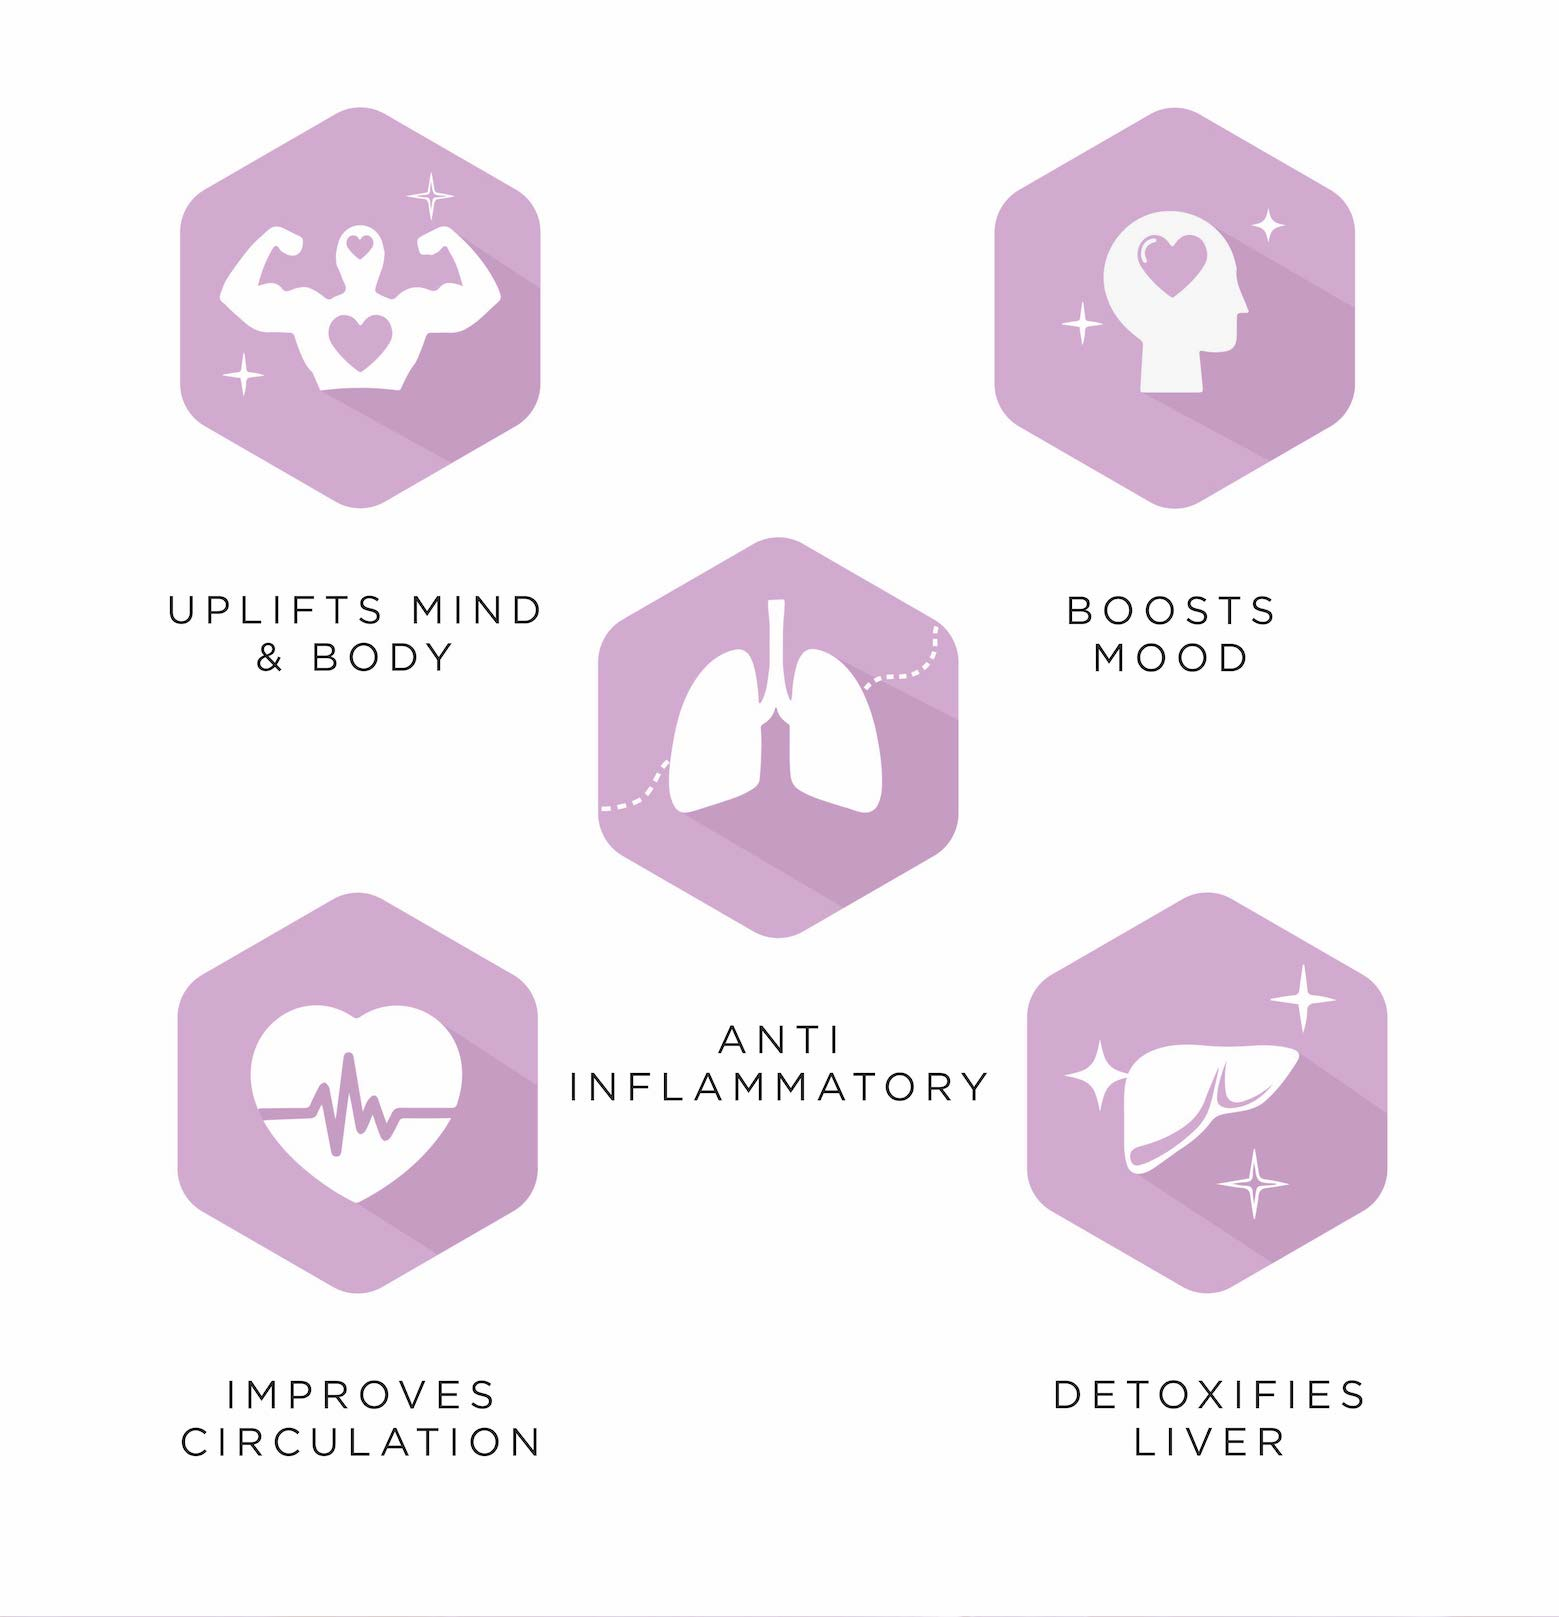 Organic Saffron Honey. - Uplifts mind & body; - Boosts mood; - Improves circulation; - Anti-inflammatory; - Detoxifies liver